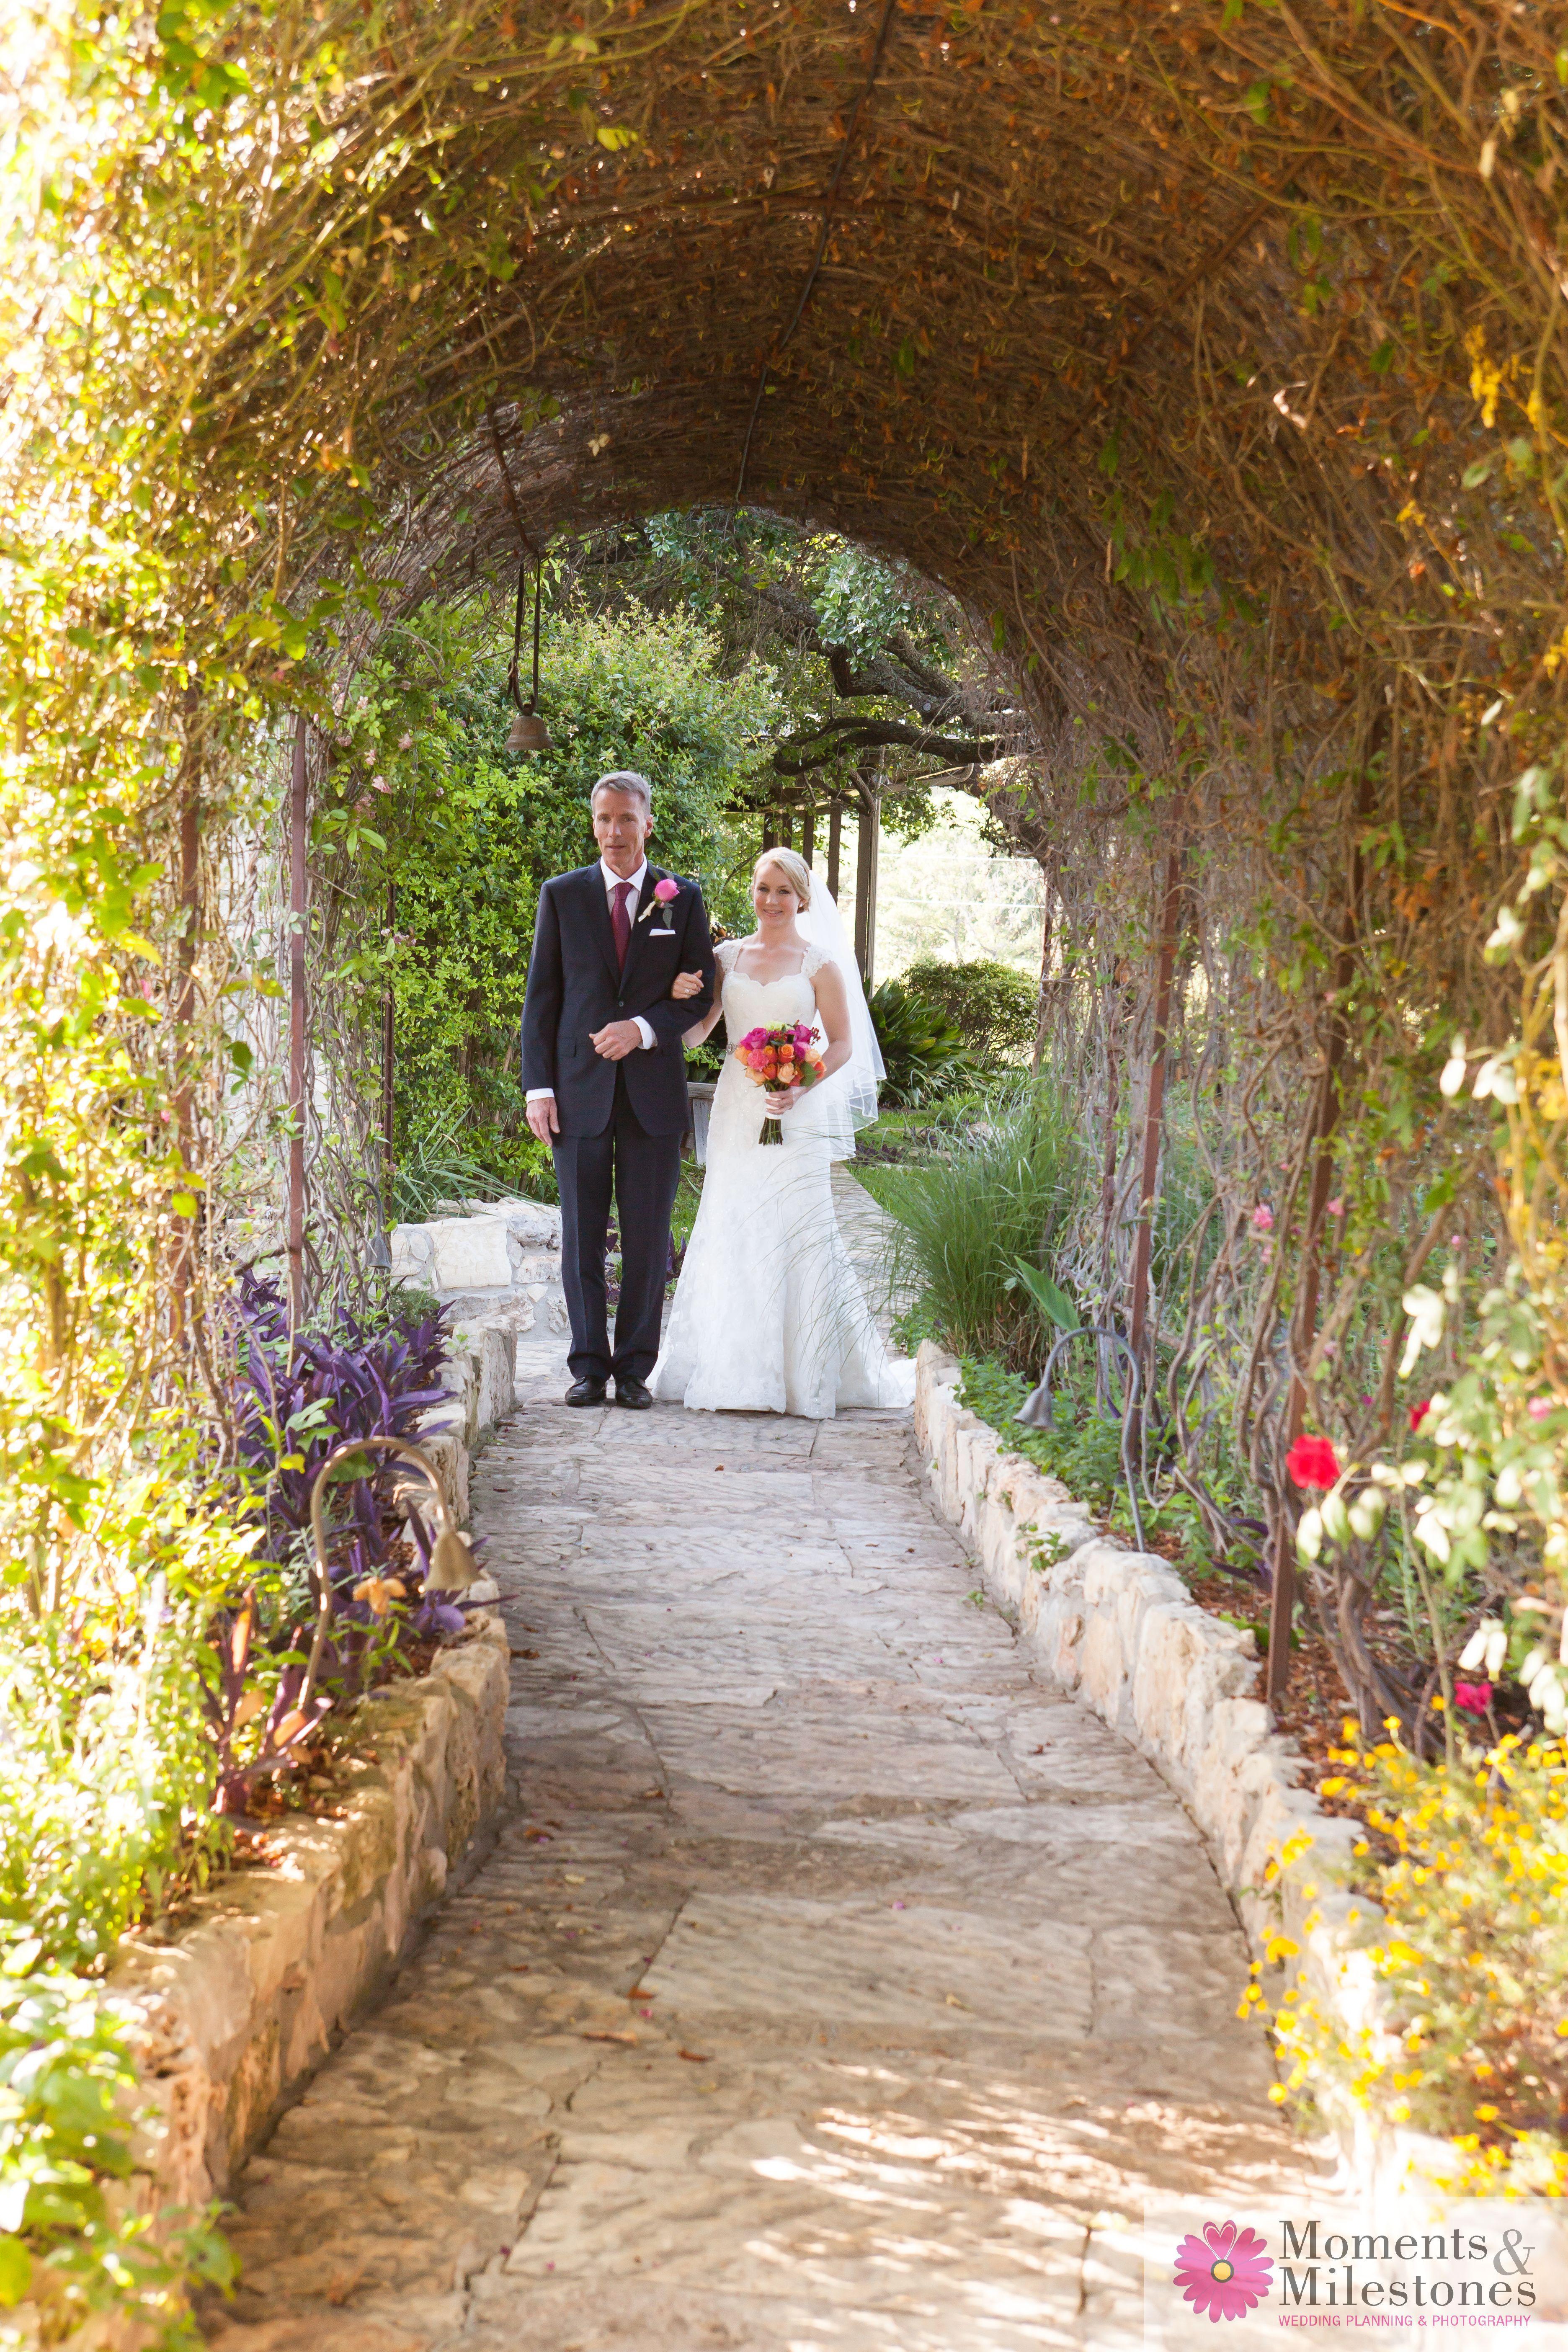 ad7019bc22082e8e8a82db9a203850f5 - San Antonio Botanical Gardens Wedding Price